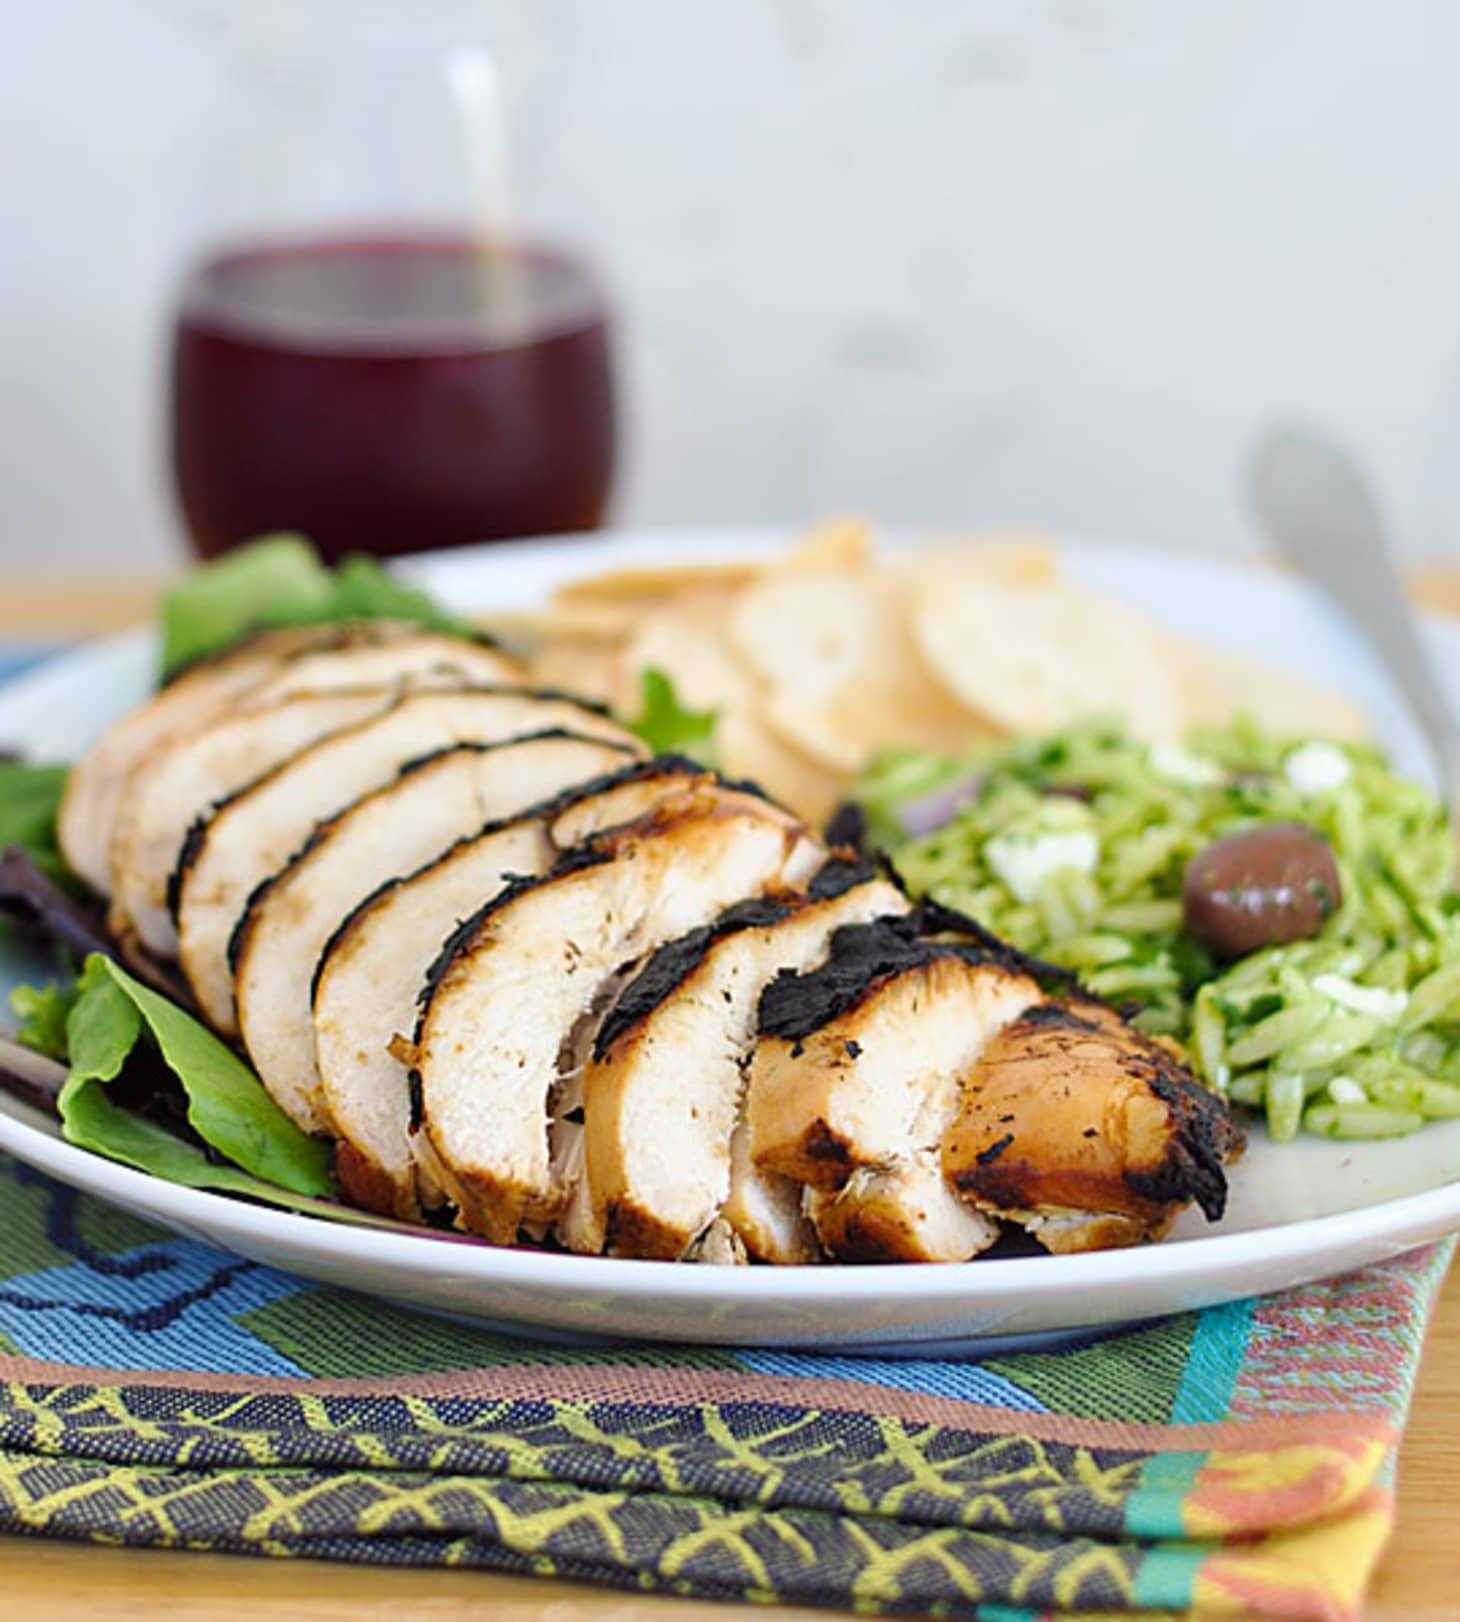 Grill Recipe: Blackened Beer-Brined Chicken Breasts